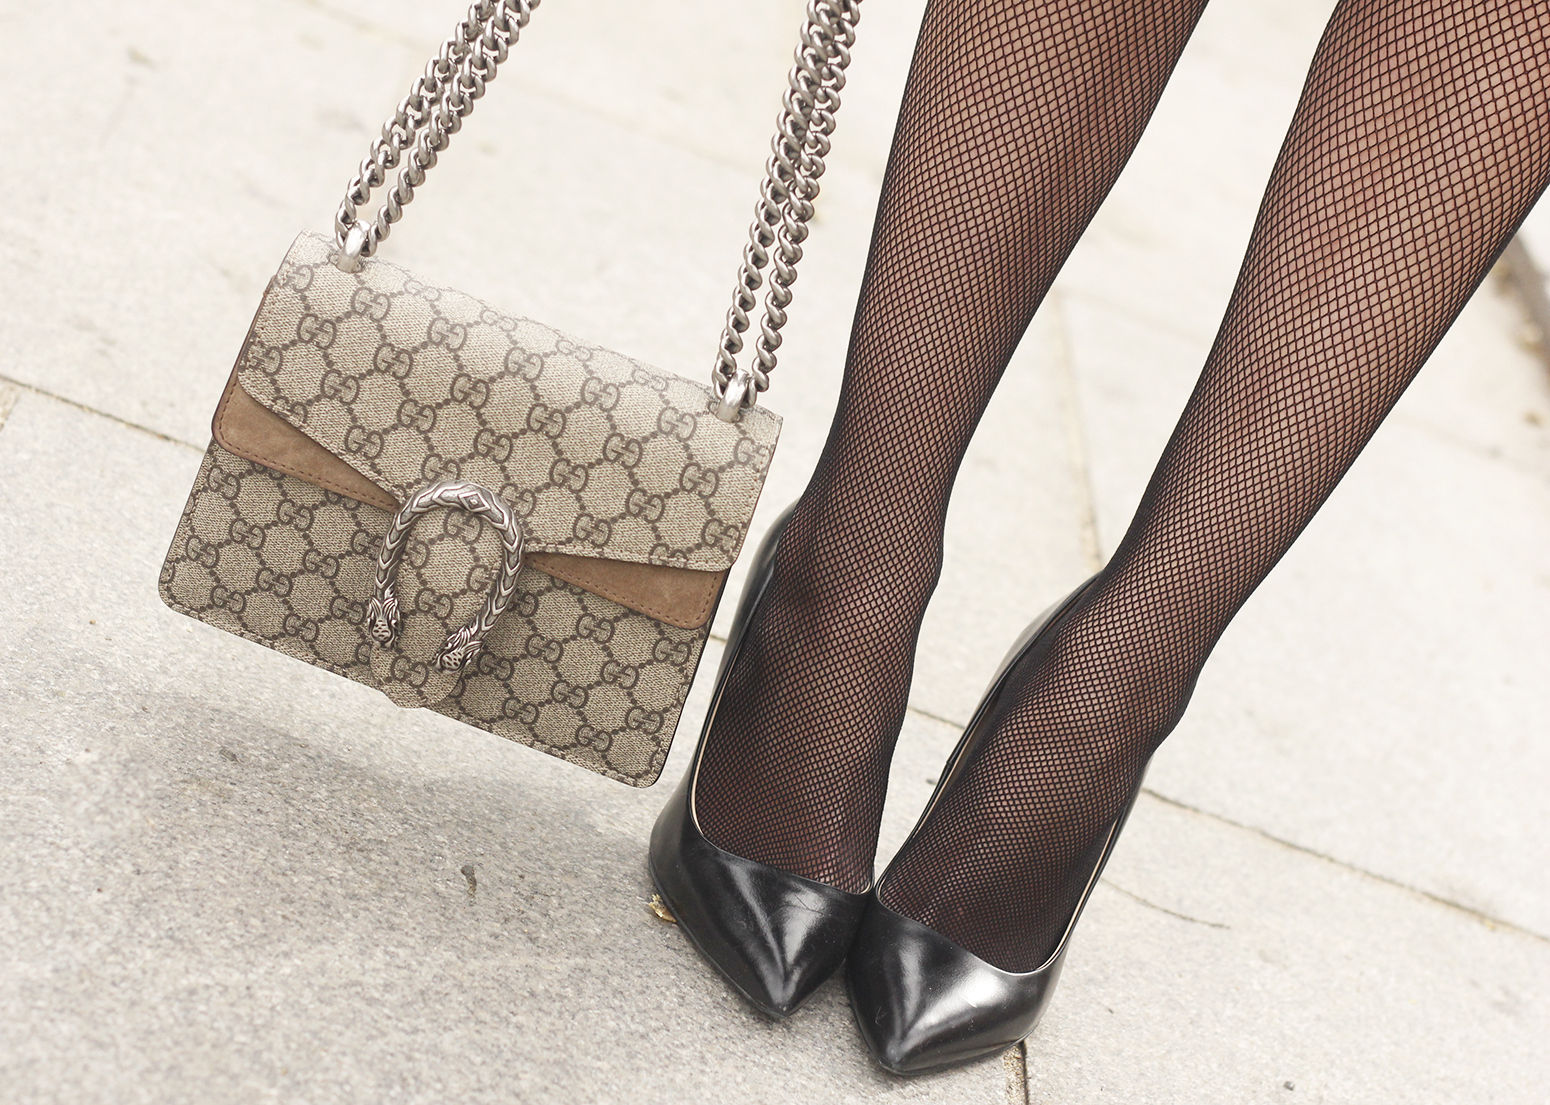 Ruffled striped shirt Fishnet tights black skirt heels gucci bag style fashion outfit 09